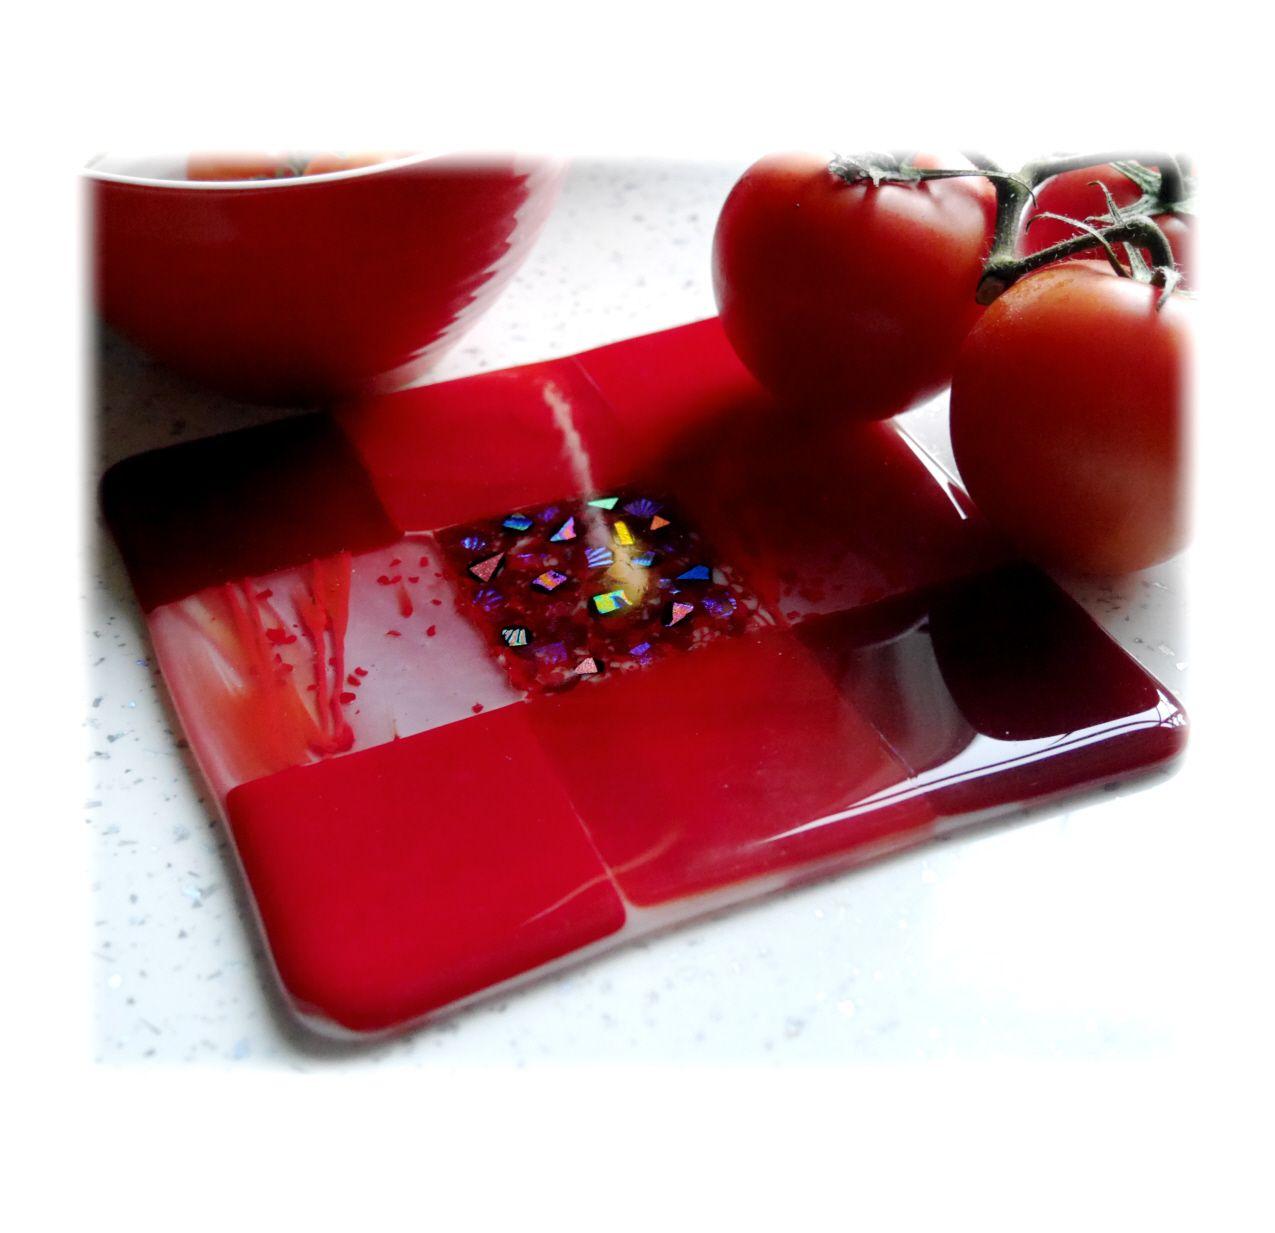 Trivet 16cm 017 #1809 Red FREE 16.00